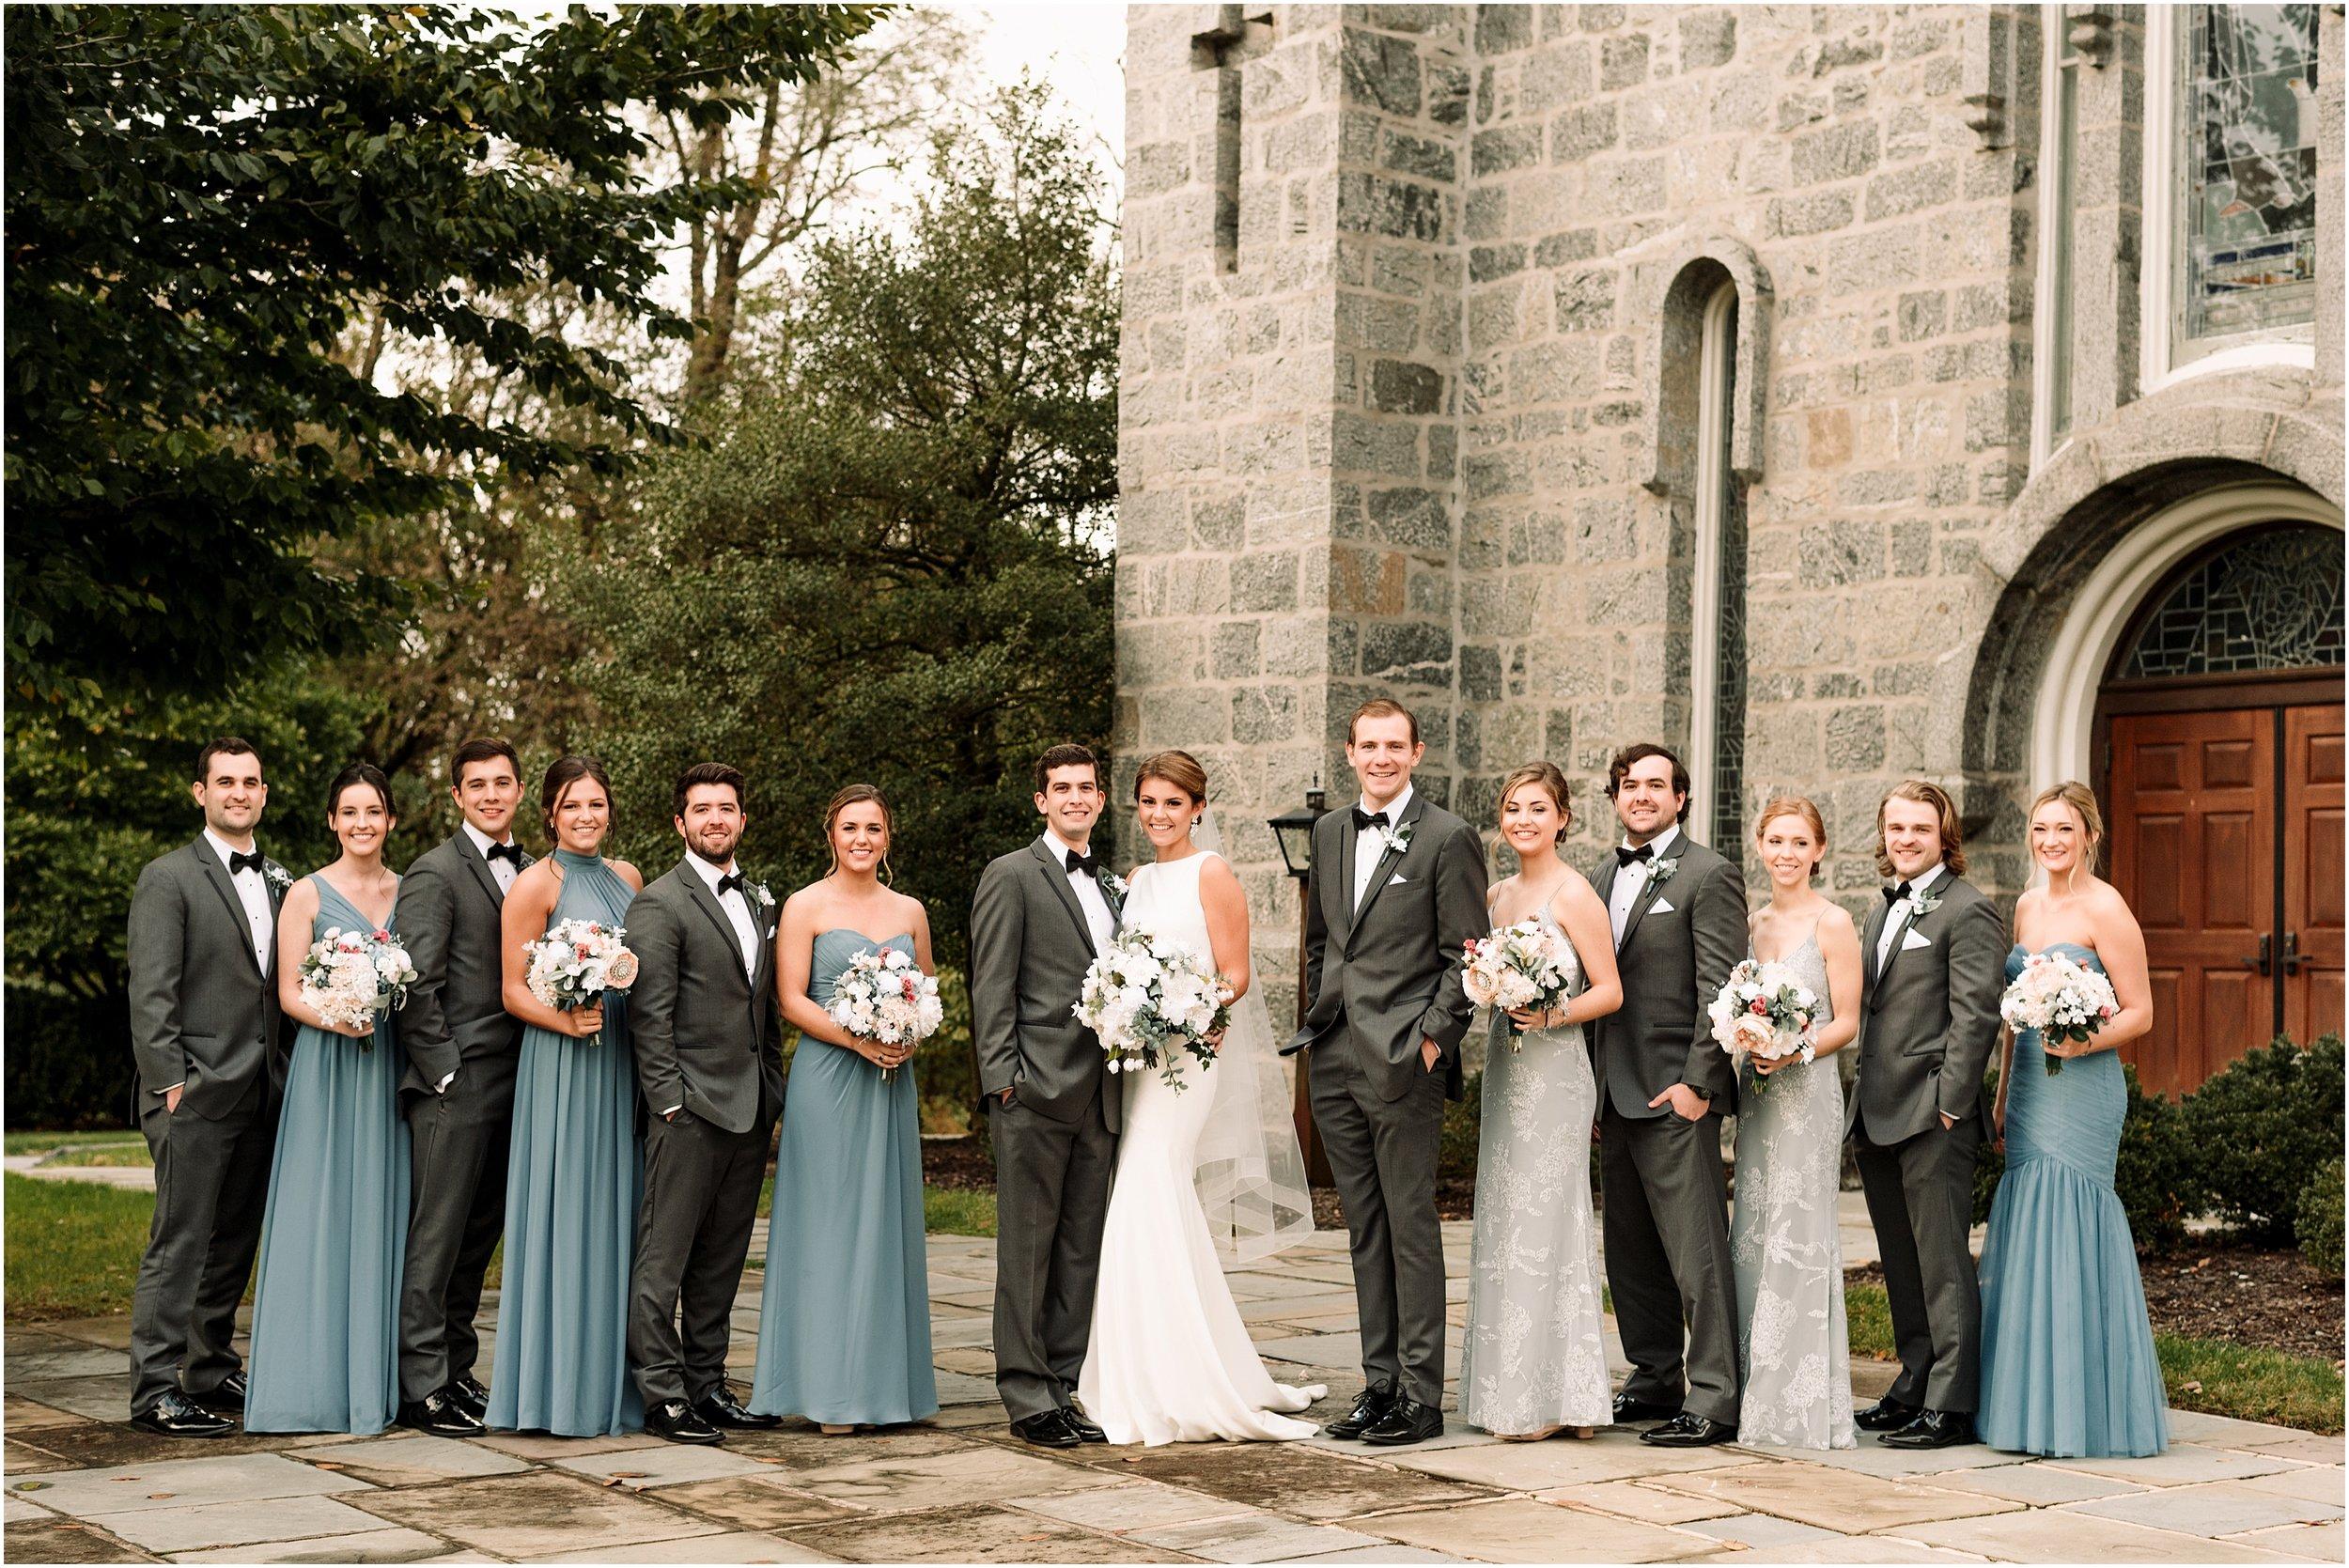 hannah leigh photography ellicott city church wedding baltimore md_2108.jpg